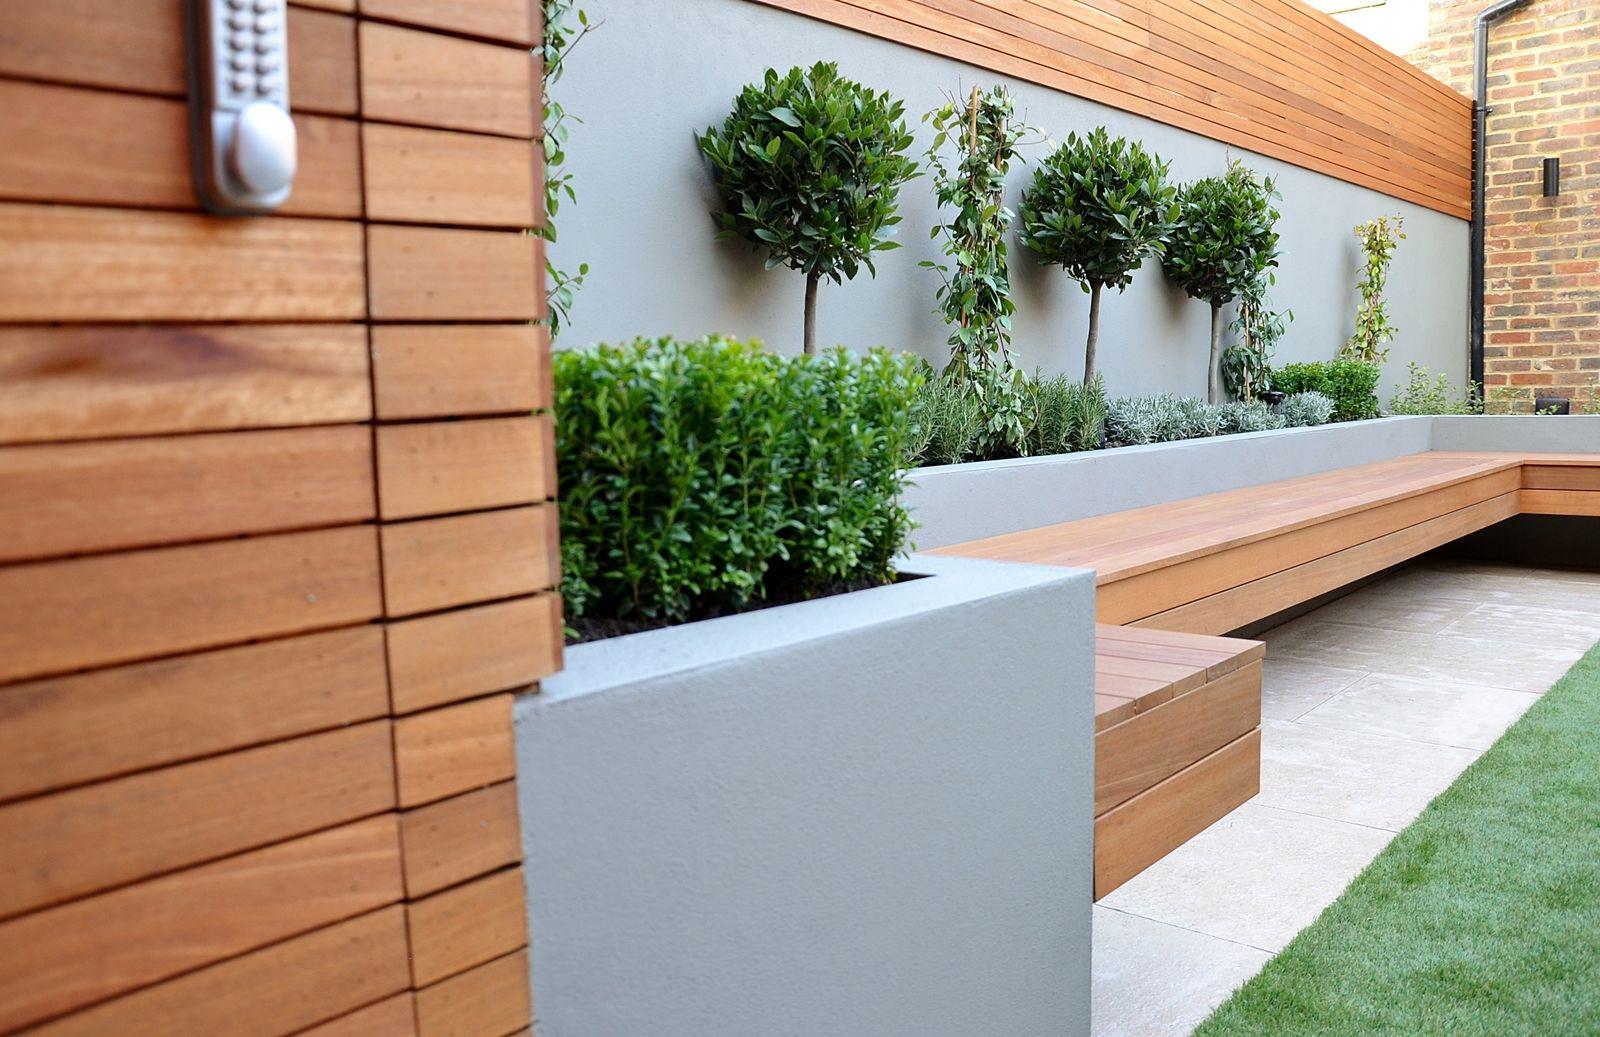 bespoke storgae in hardwood slats raised beds render block walls bench in hardwood garden